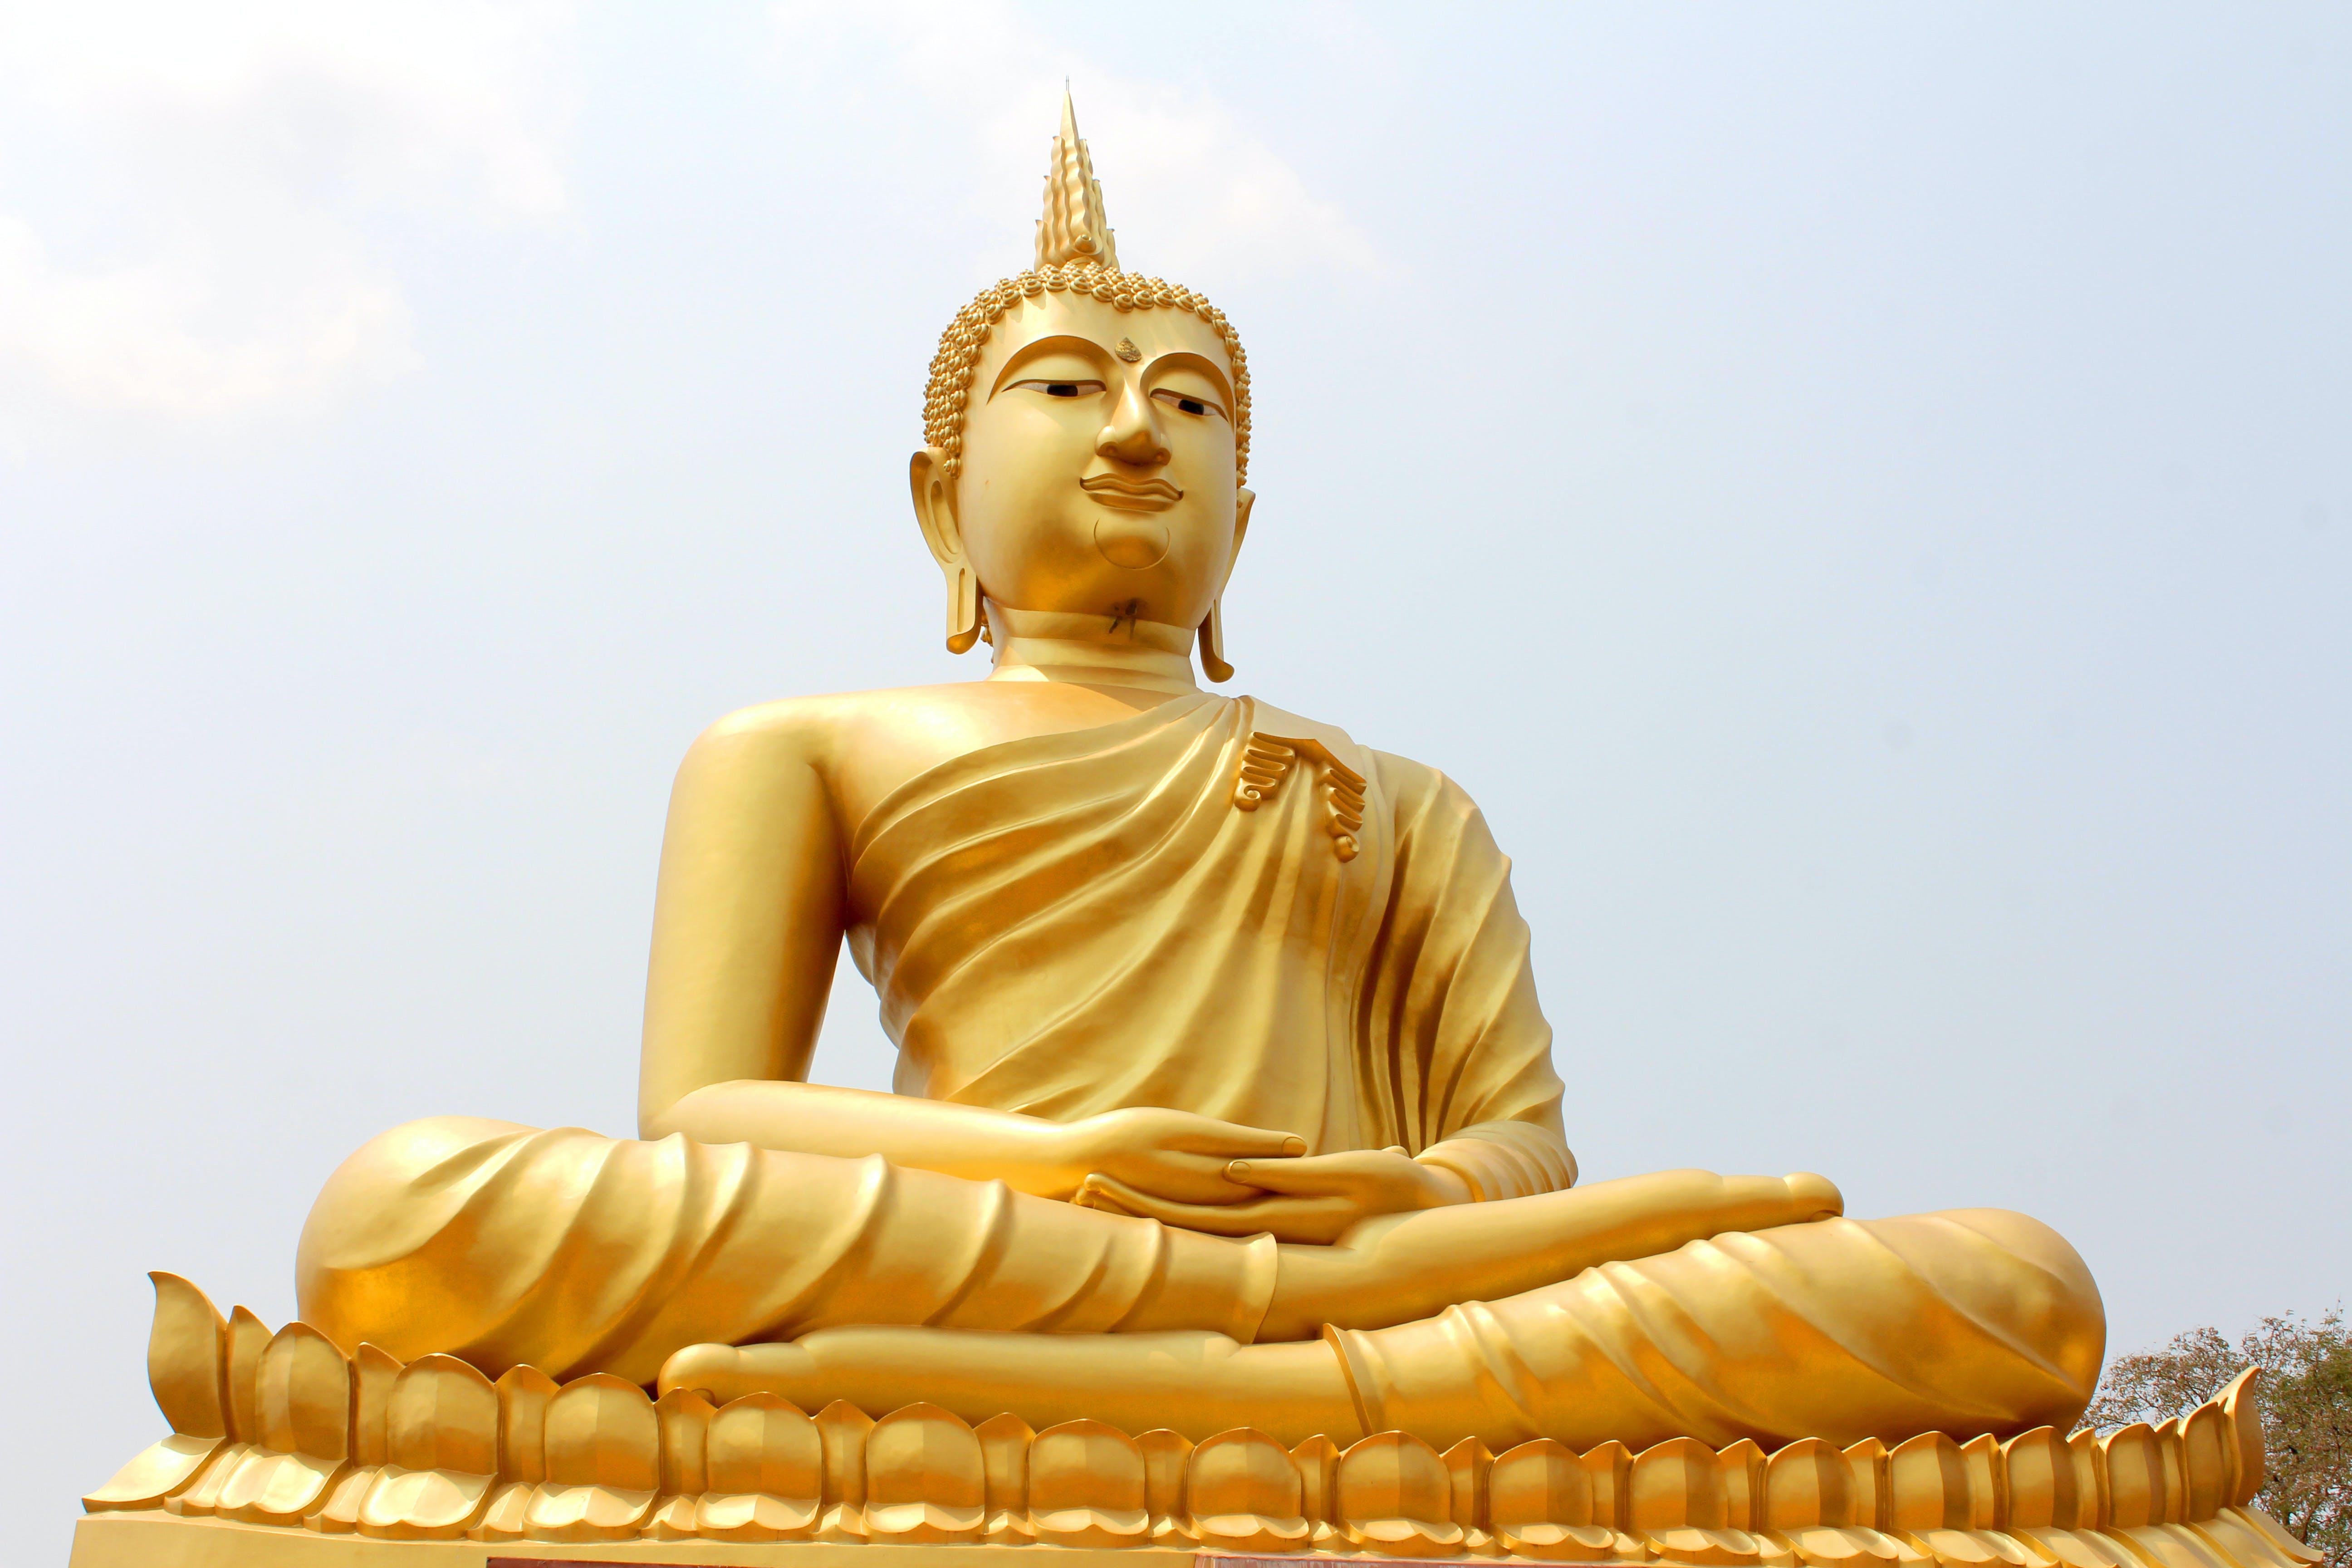 Gold Gautama Buddha Statue